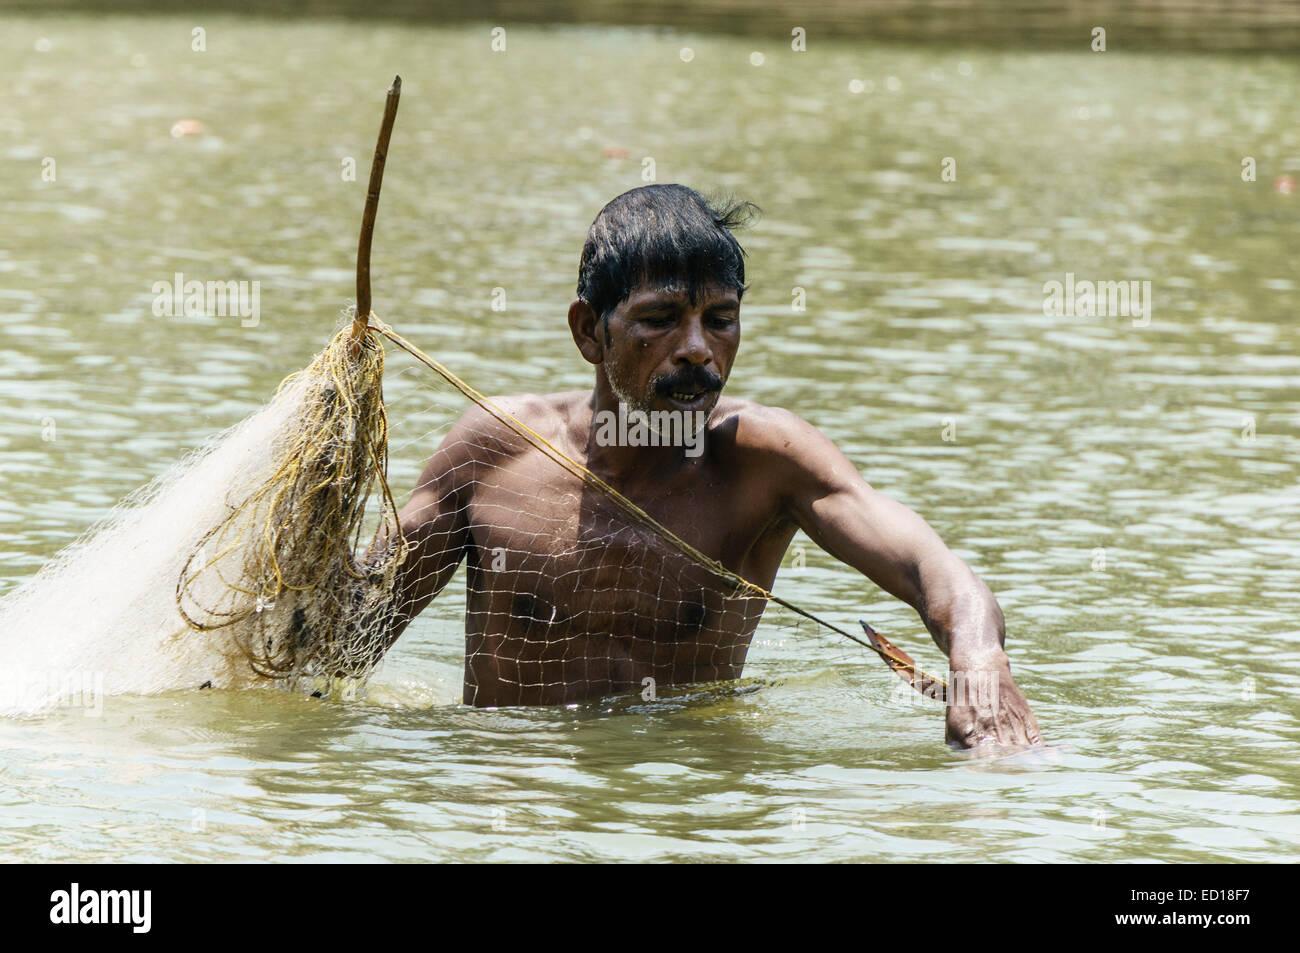 Kerala, India - Poovar. Mangrove swamp fishing at Poover Beach South. - Stock Image